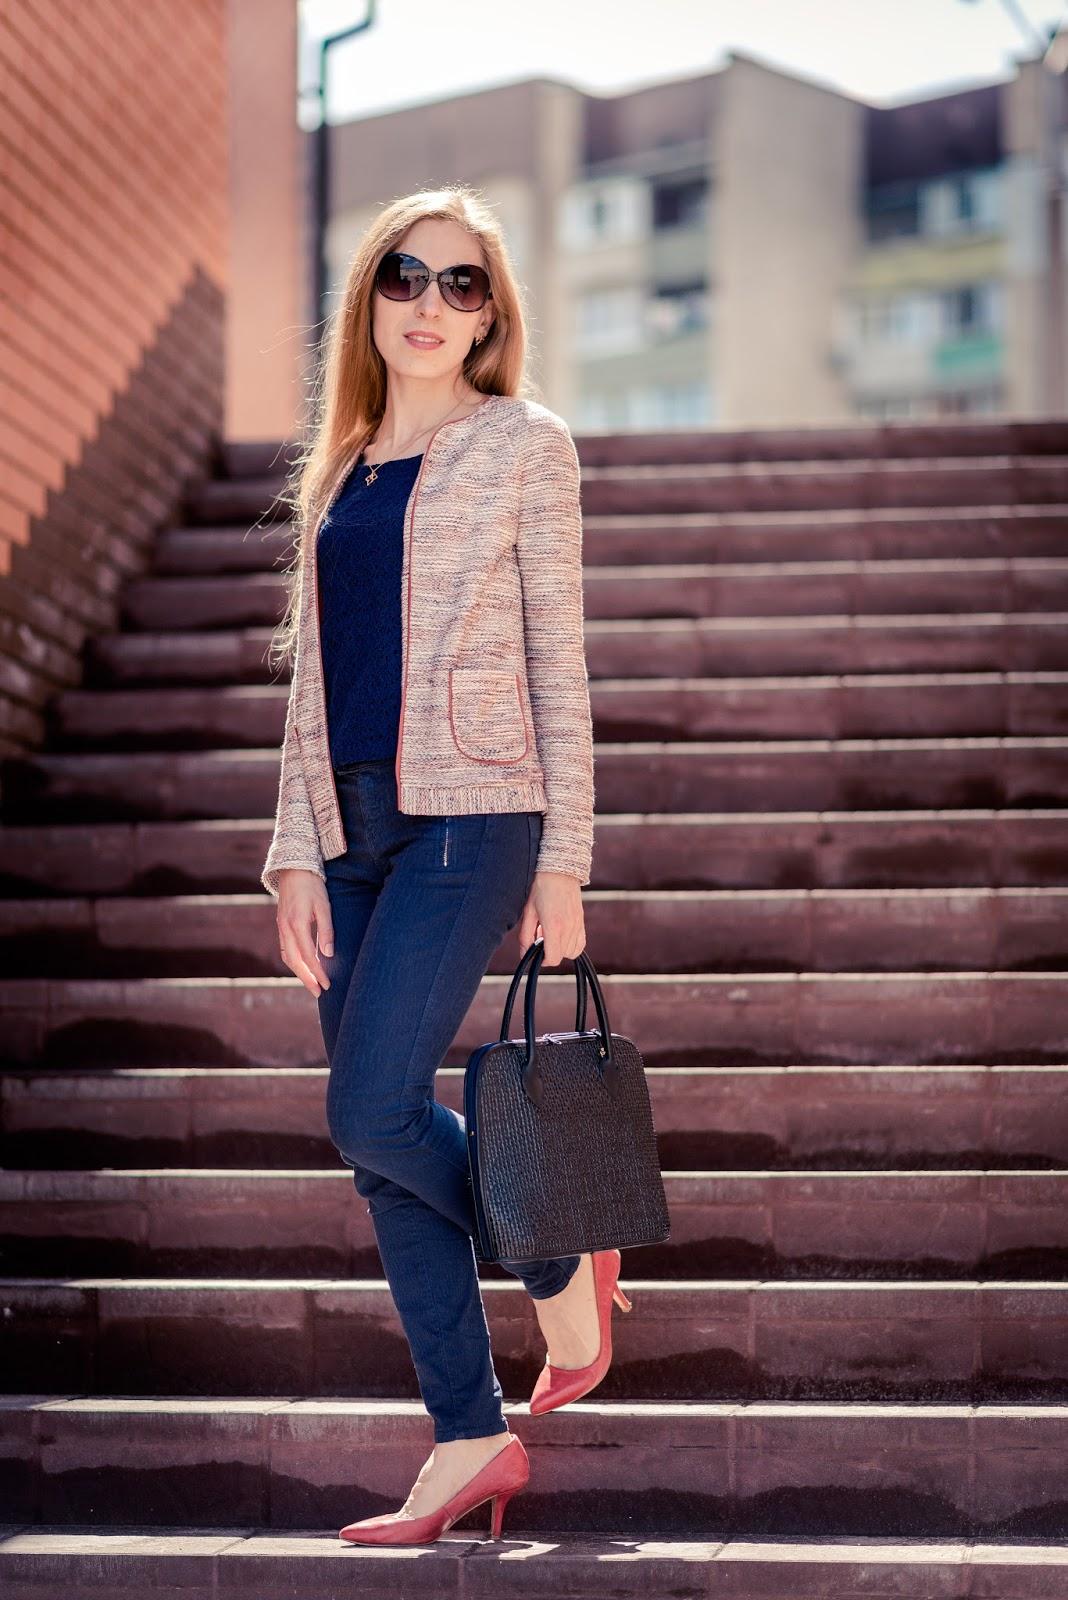 Melange jacket and red heels - style